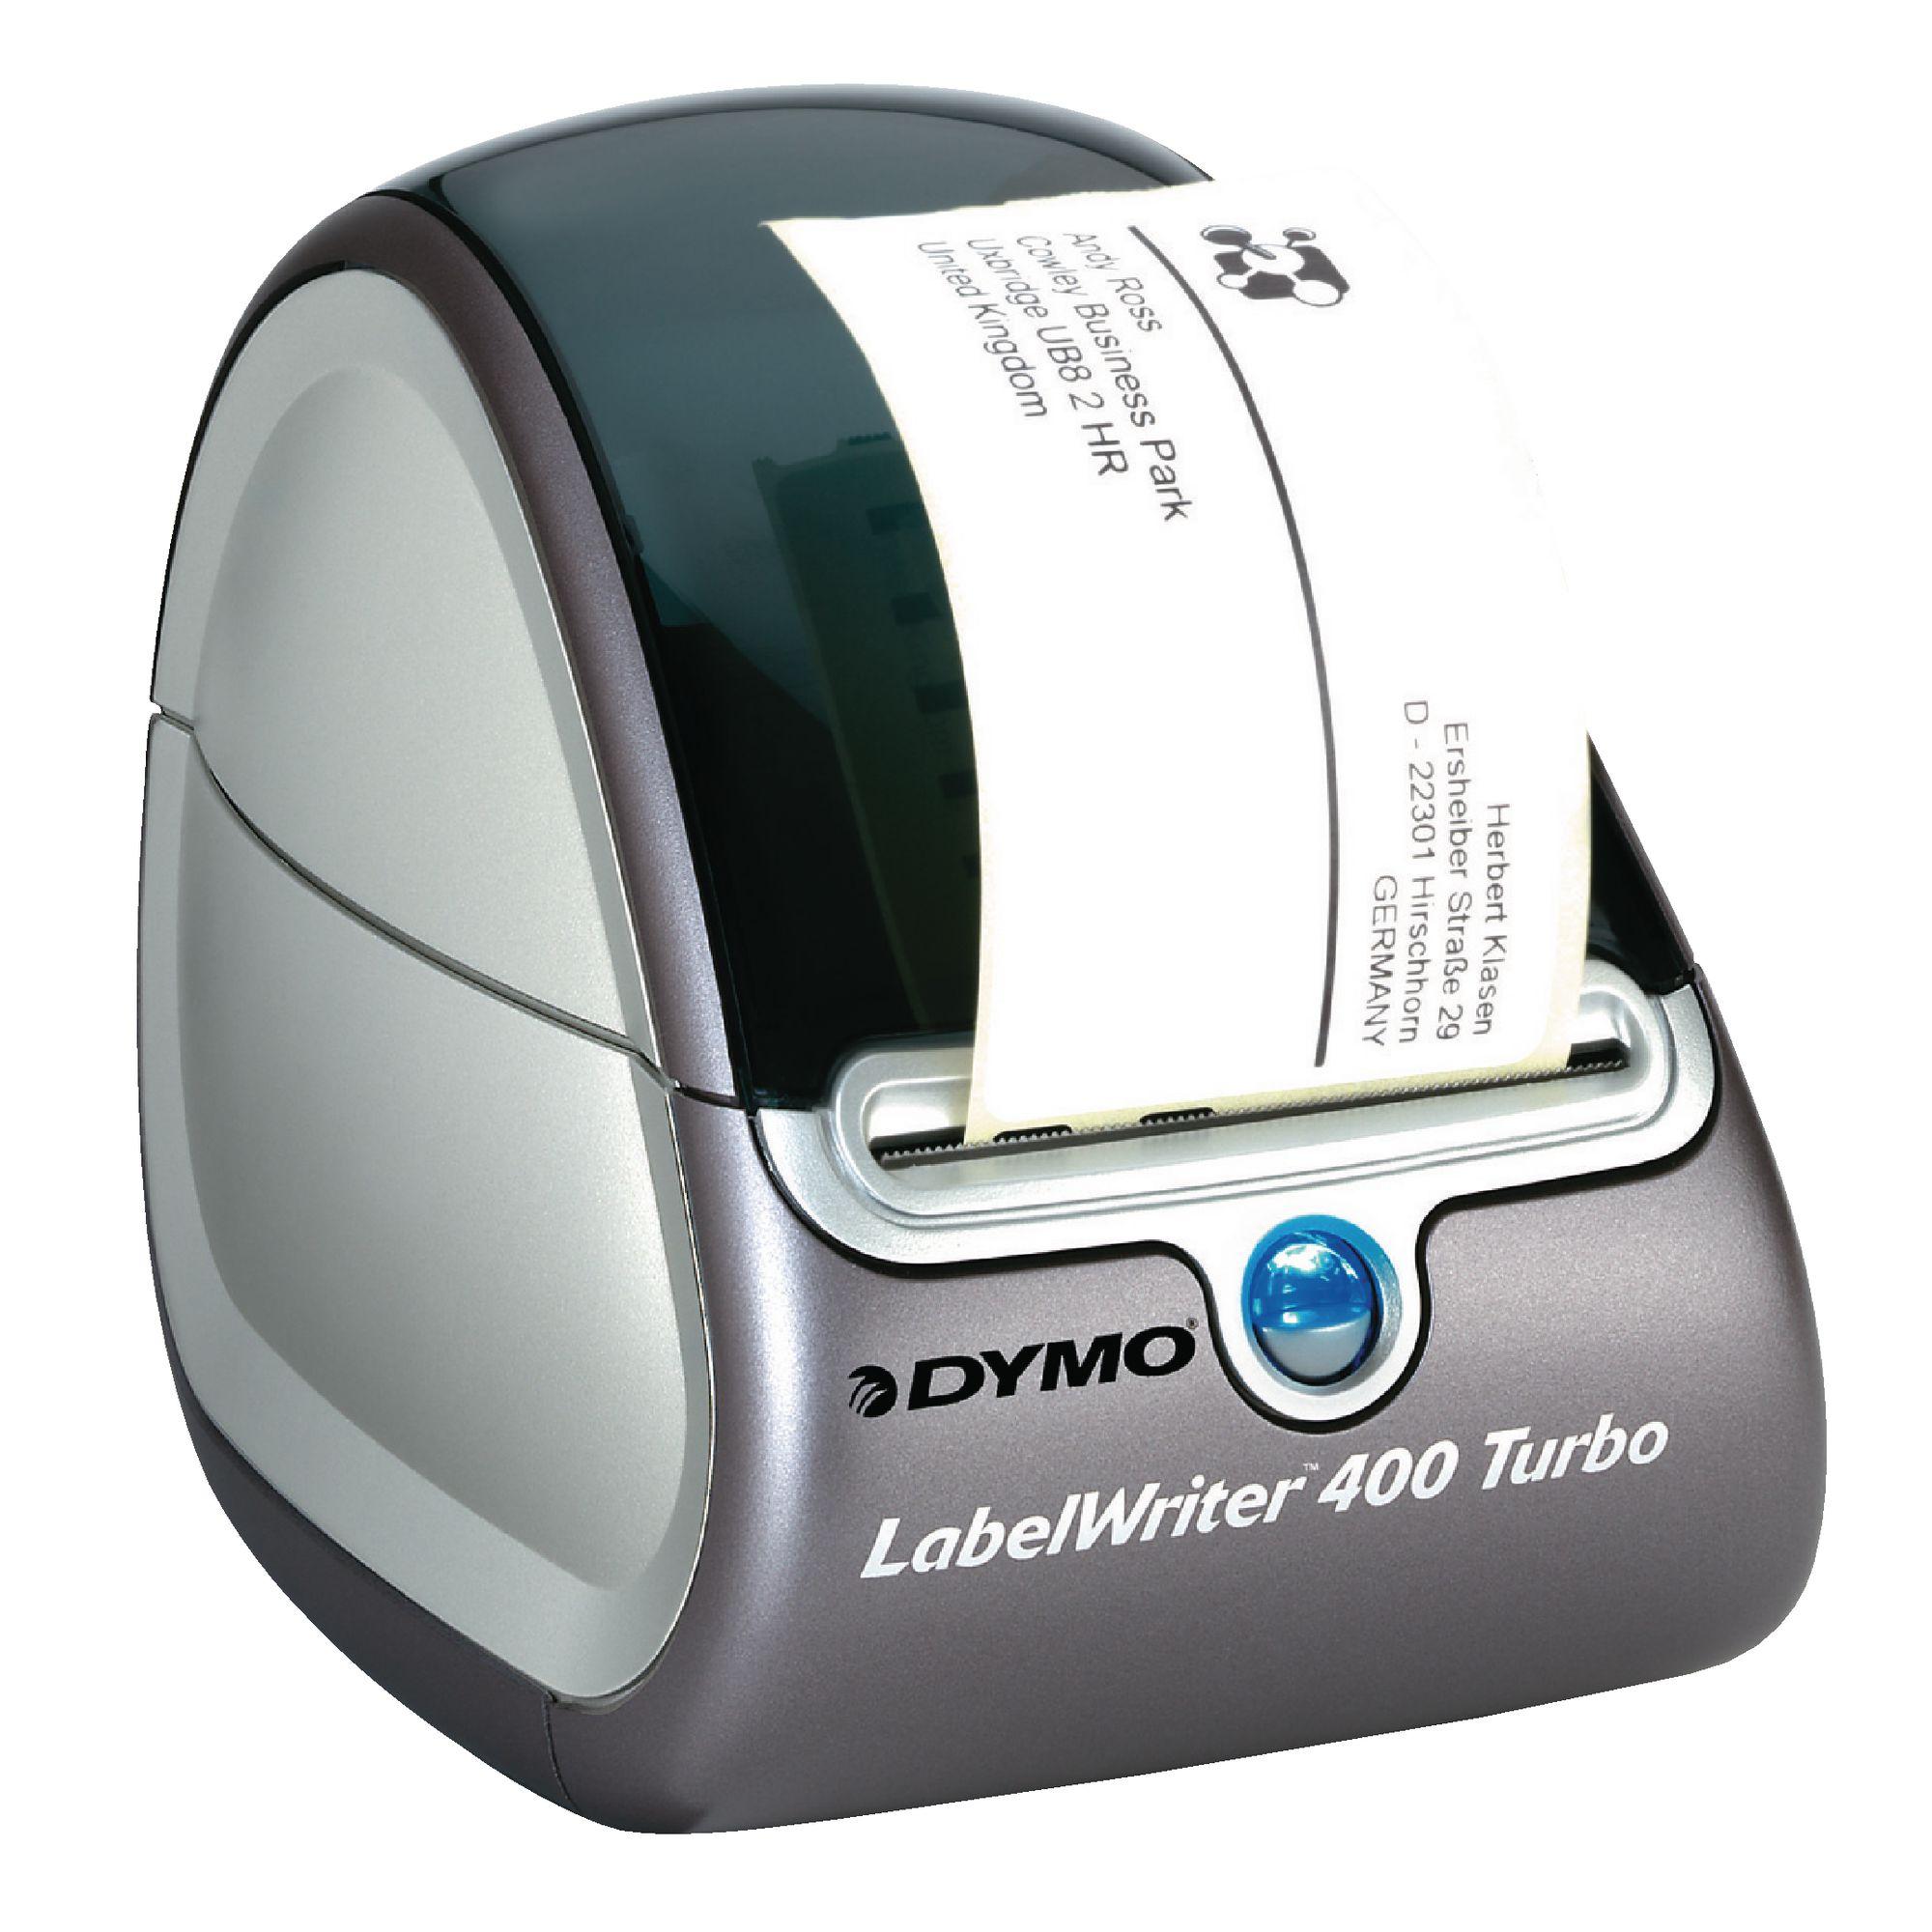 DYMO LABELWRITER 450 LABEL PRINTER DRIVERS FOR WINDOWS XP